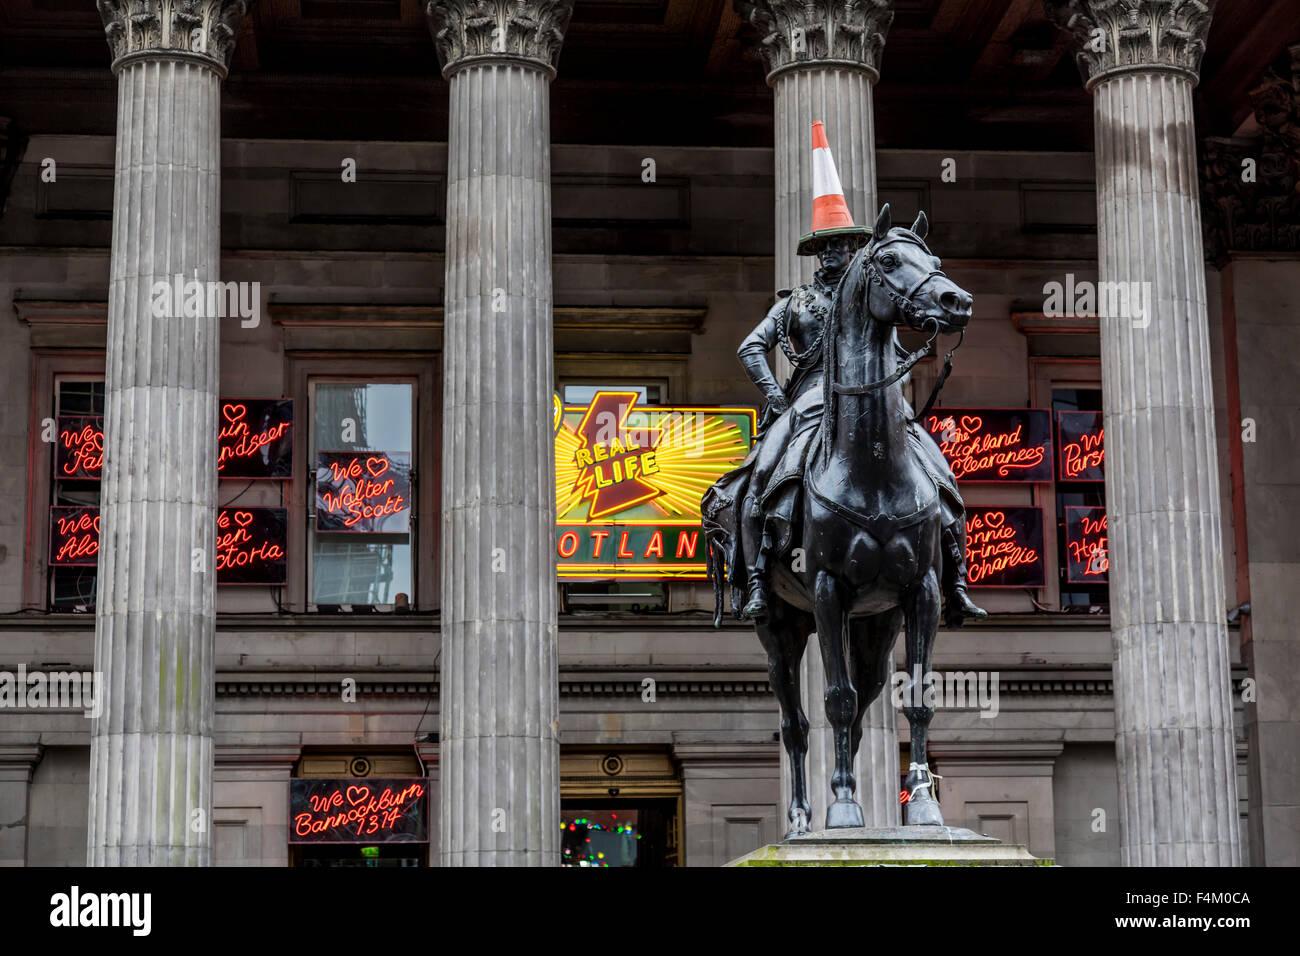 The Duke of Wellington statue beside the Gallery of Modern Art in Glasgow city centre, Scotland, UK - Stock Image